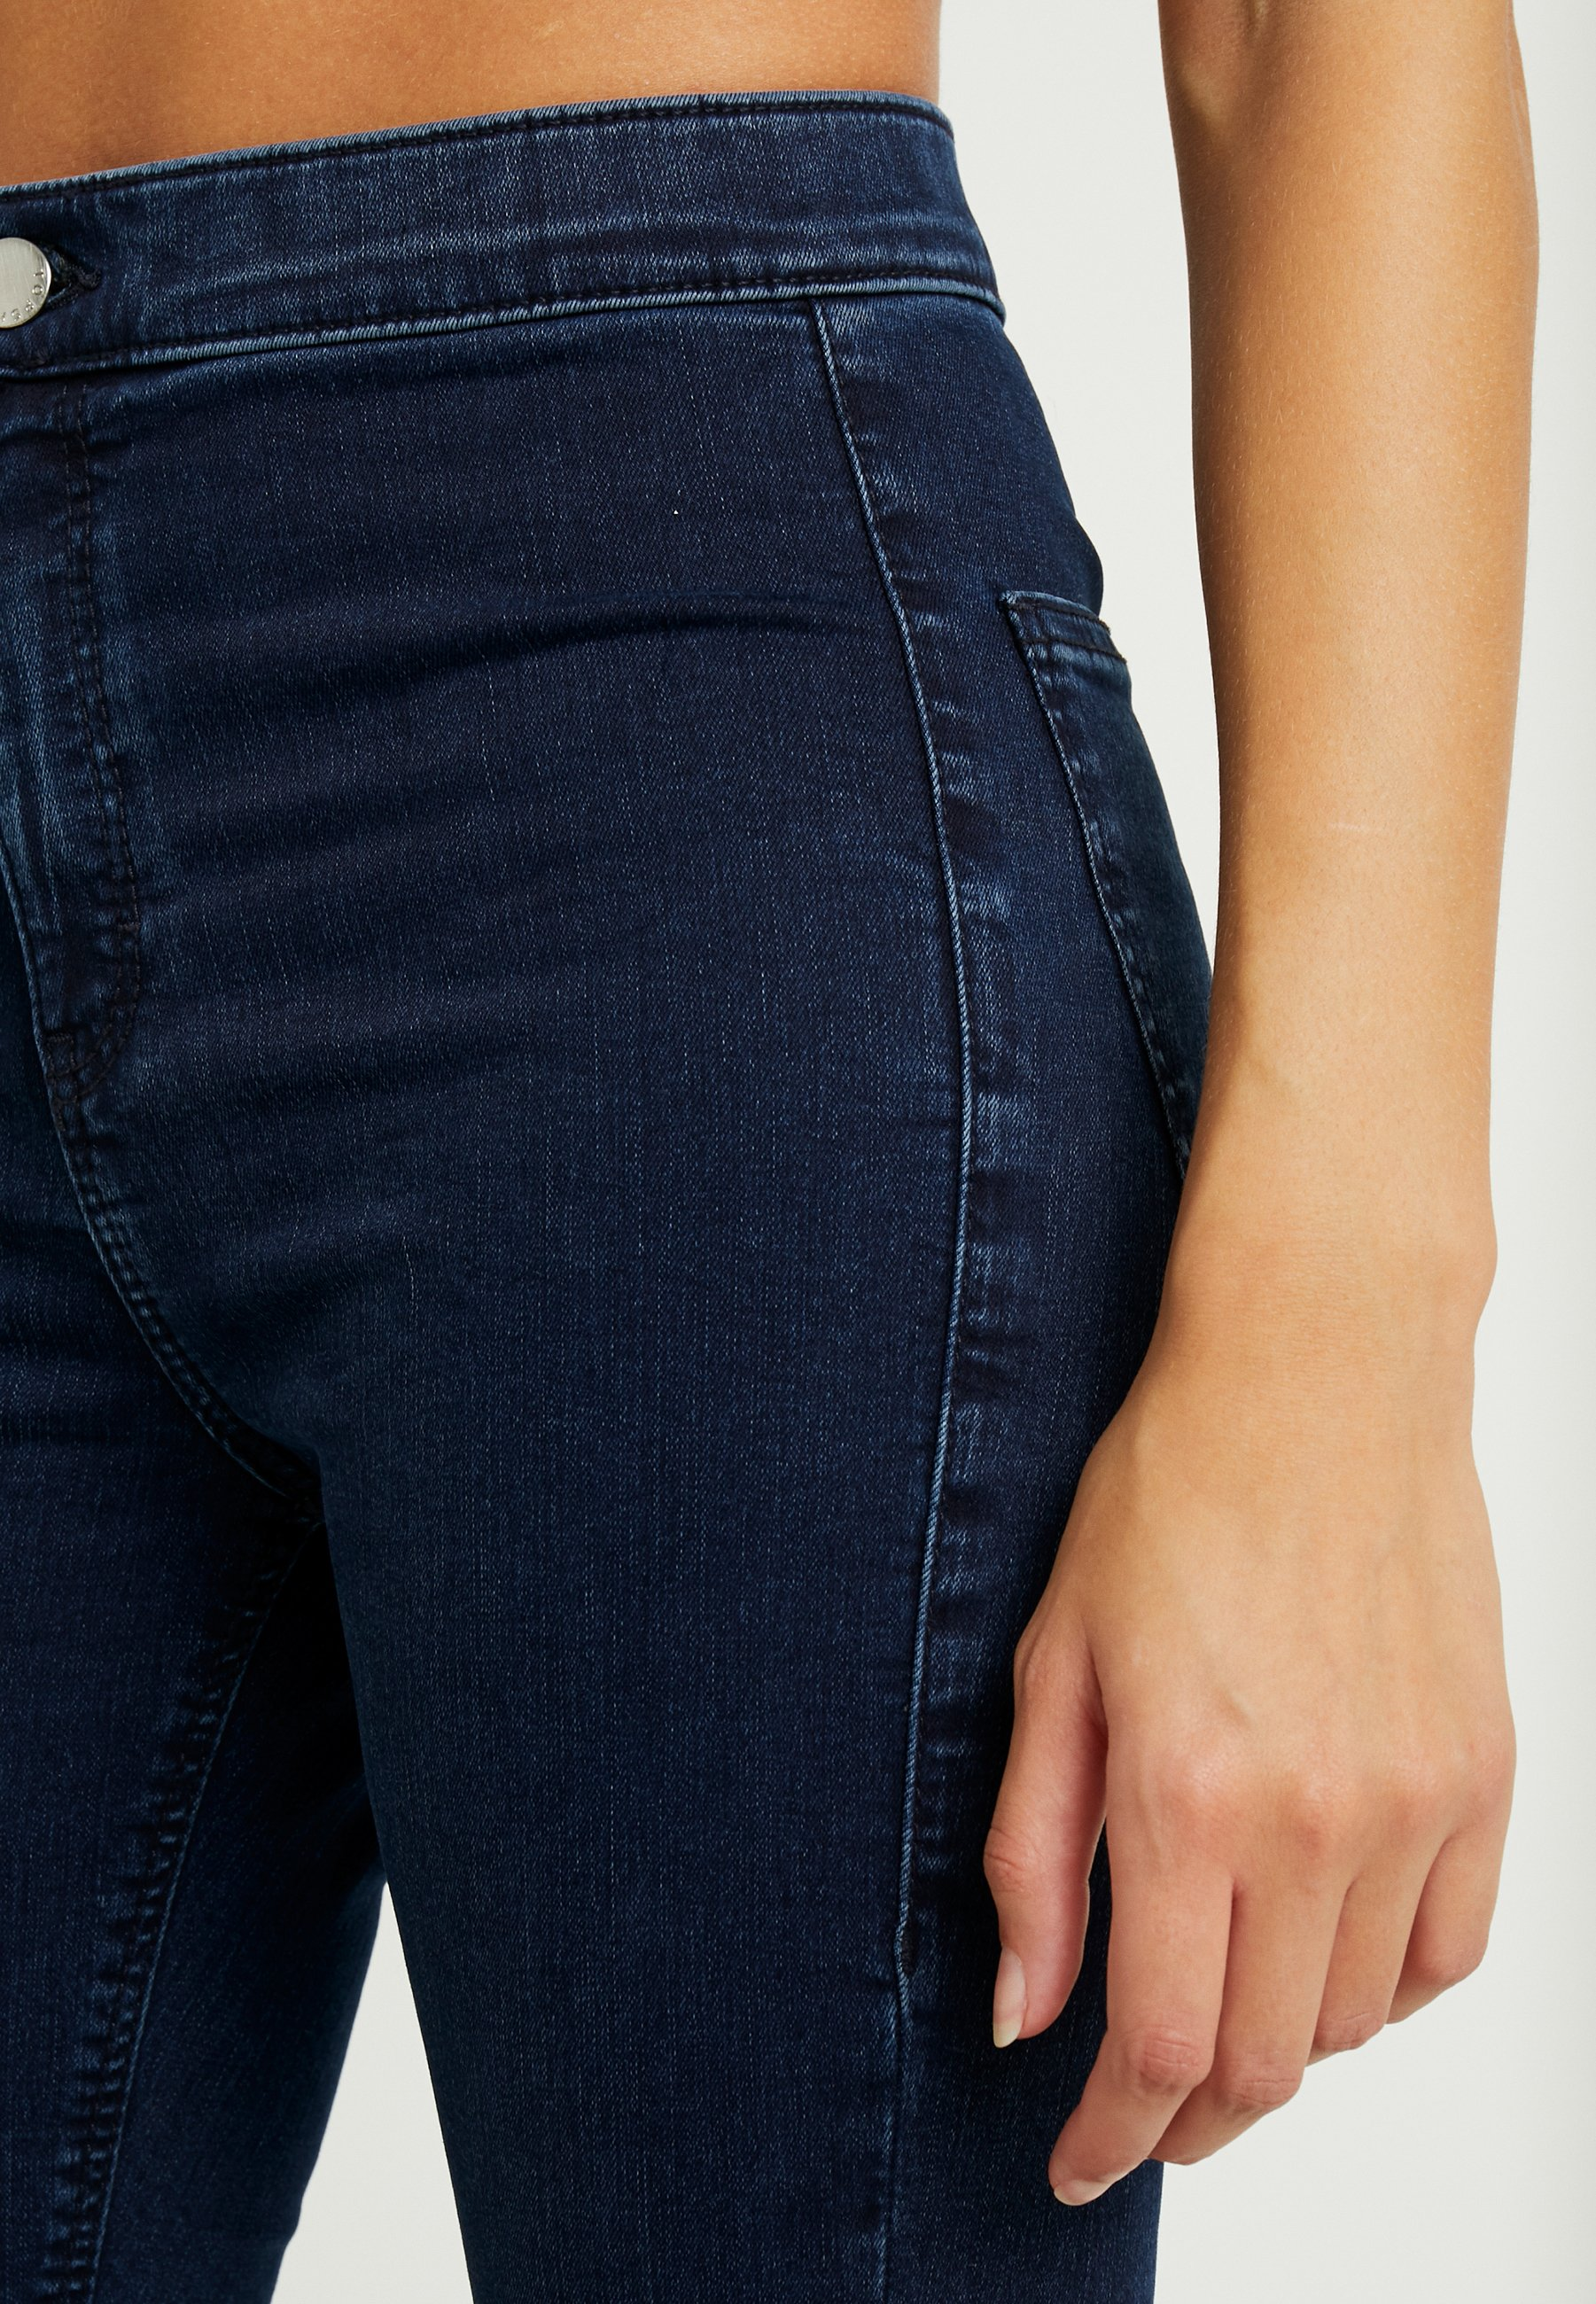 Topshop Petite Joni Clean - Jeans Skinny Fit Indigo